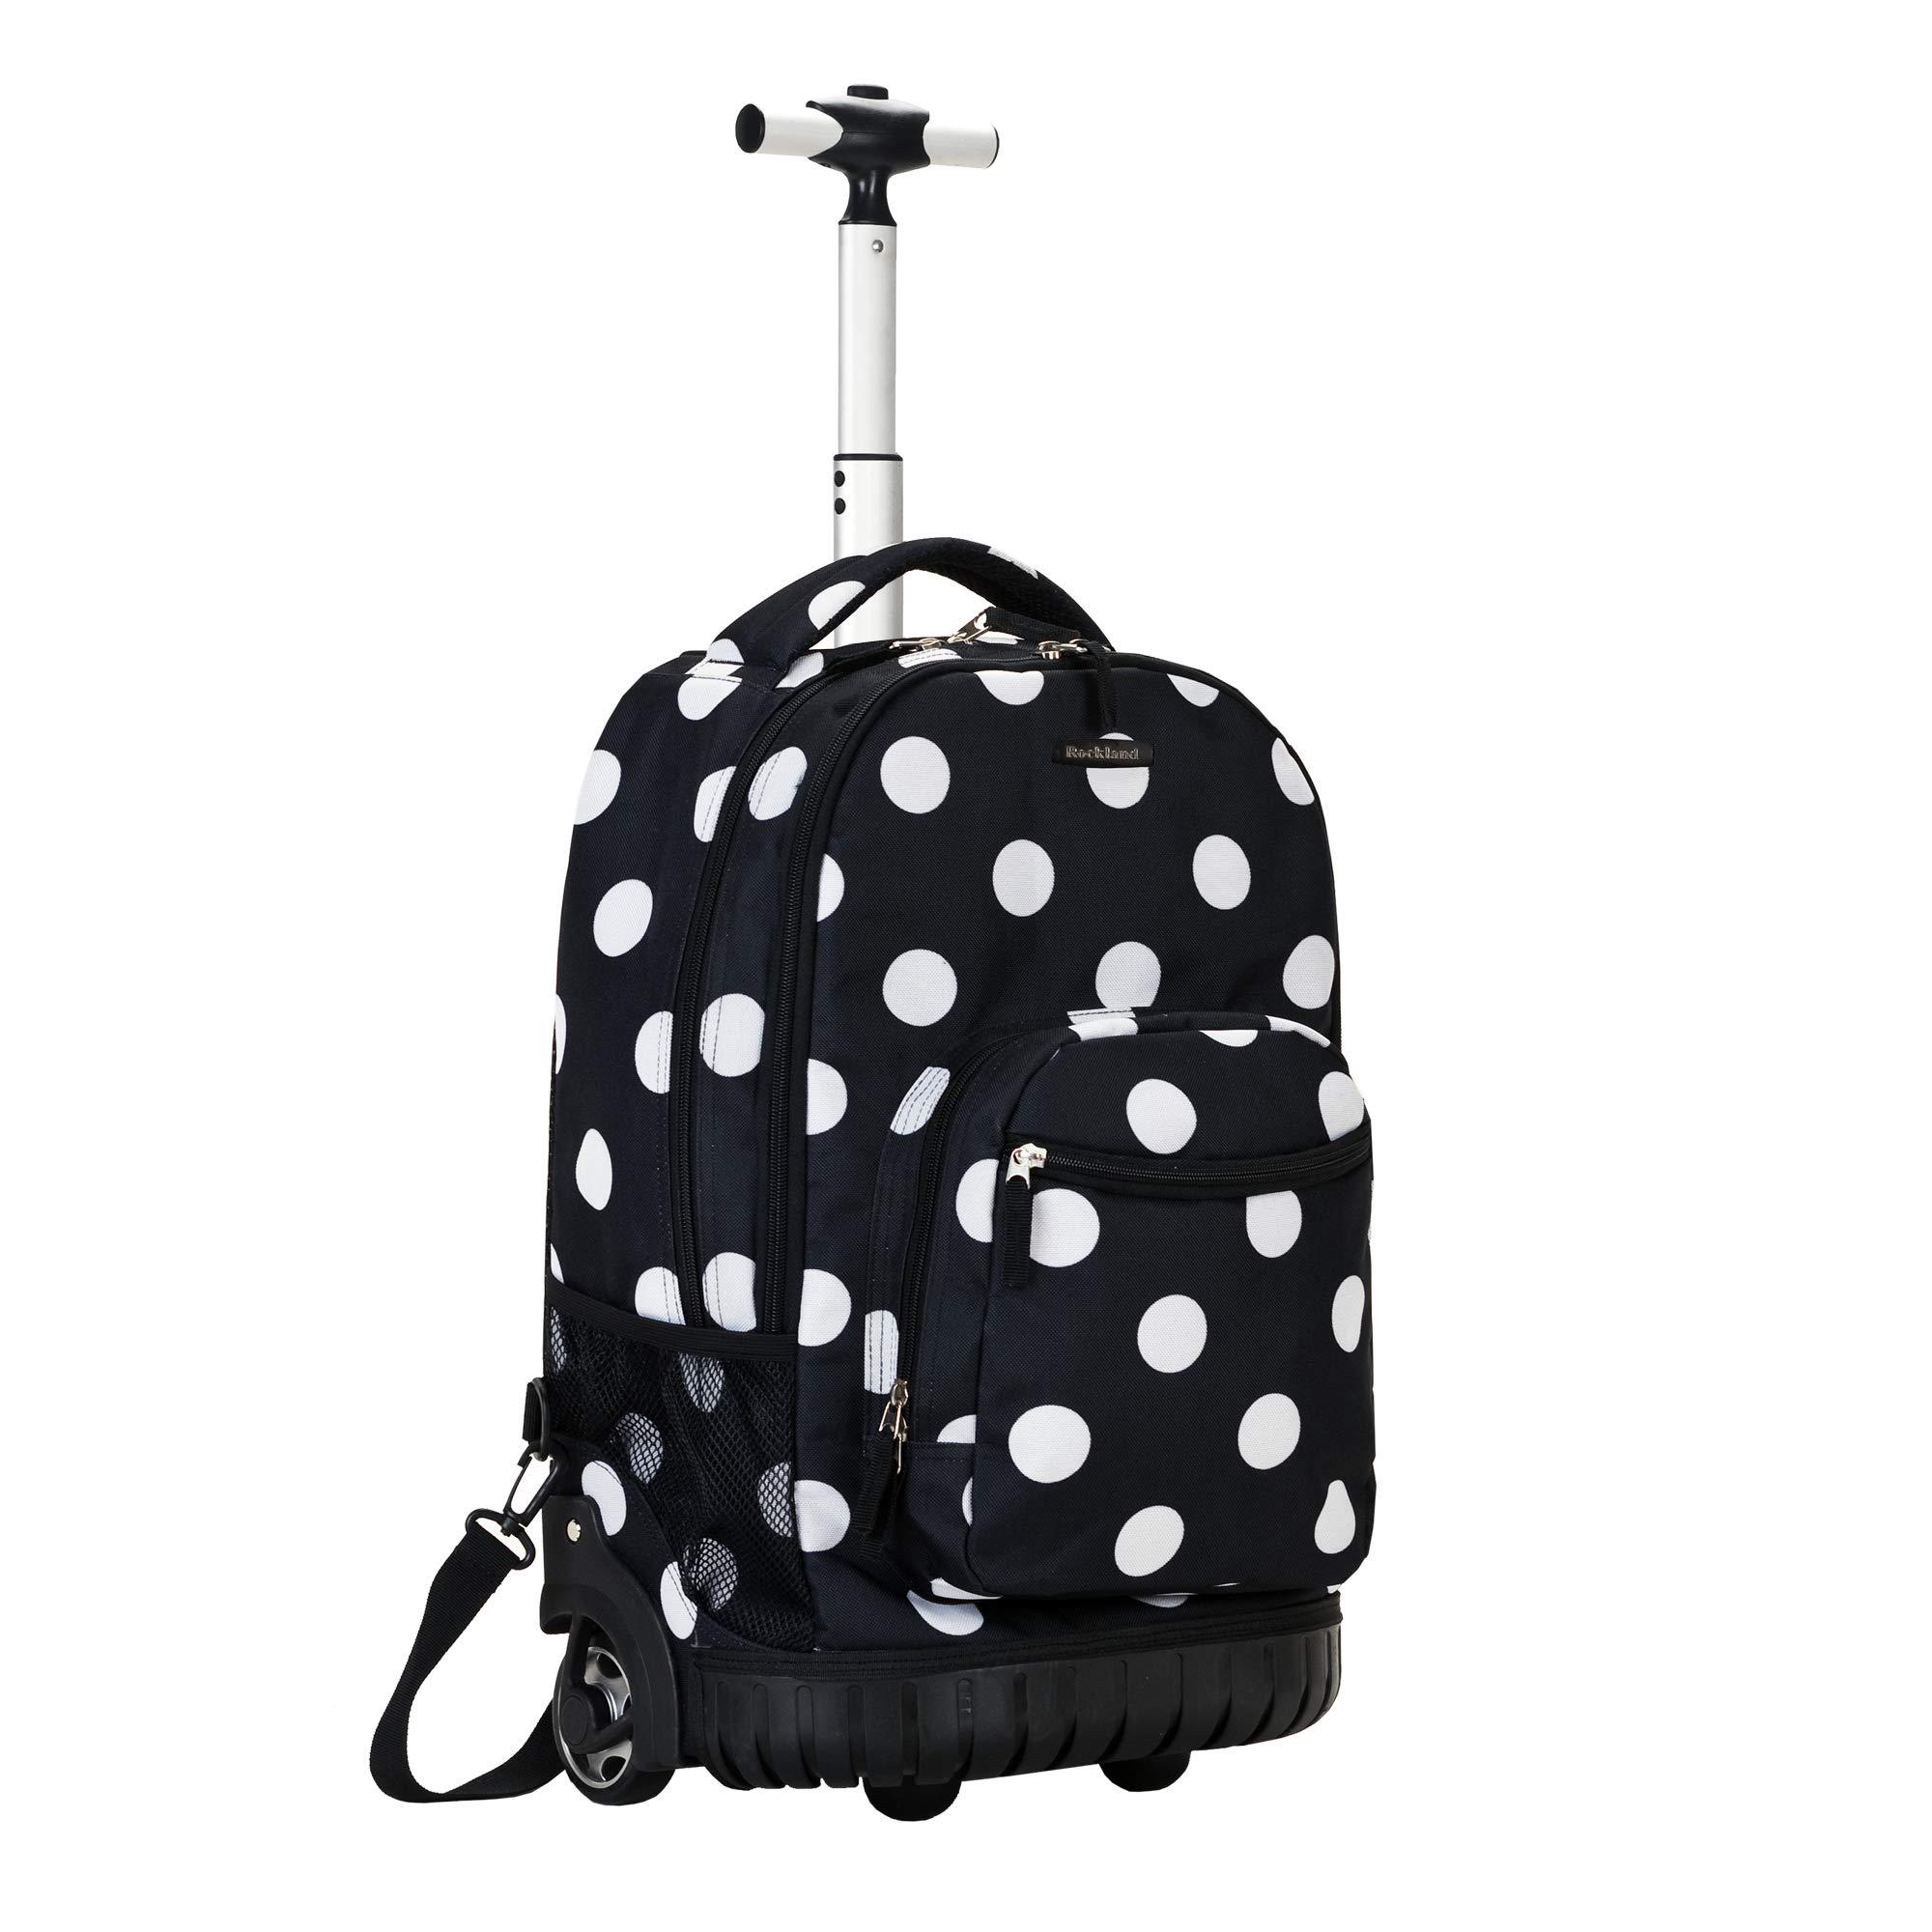 Rockland Luggage 19 Inch Rolling Backpack Printed, Black Dot, Medium